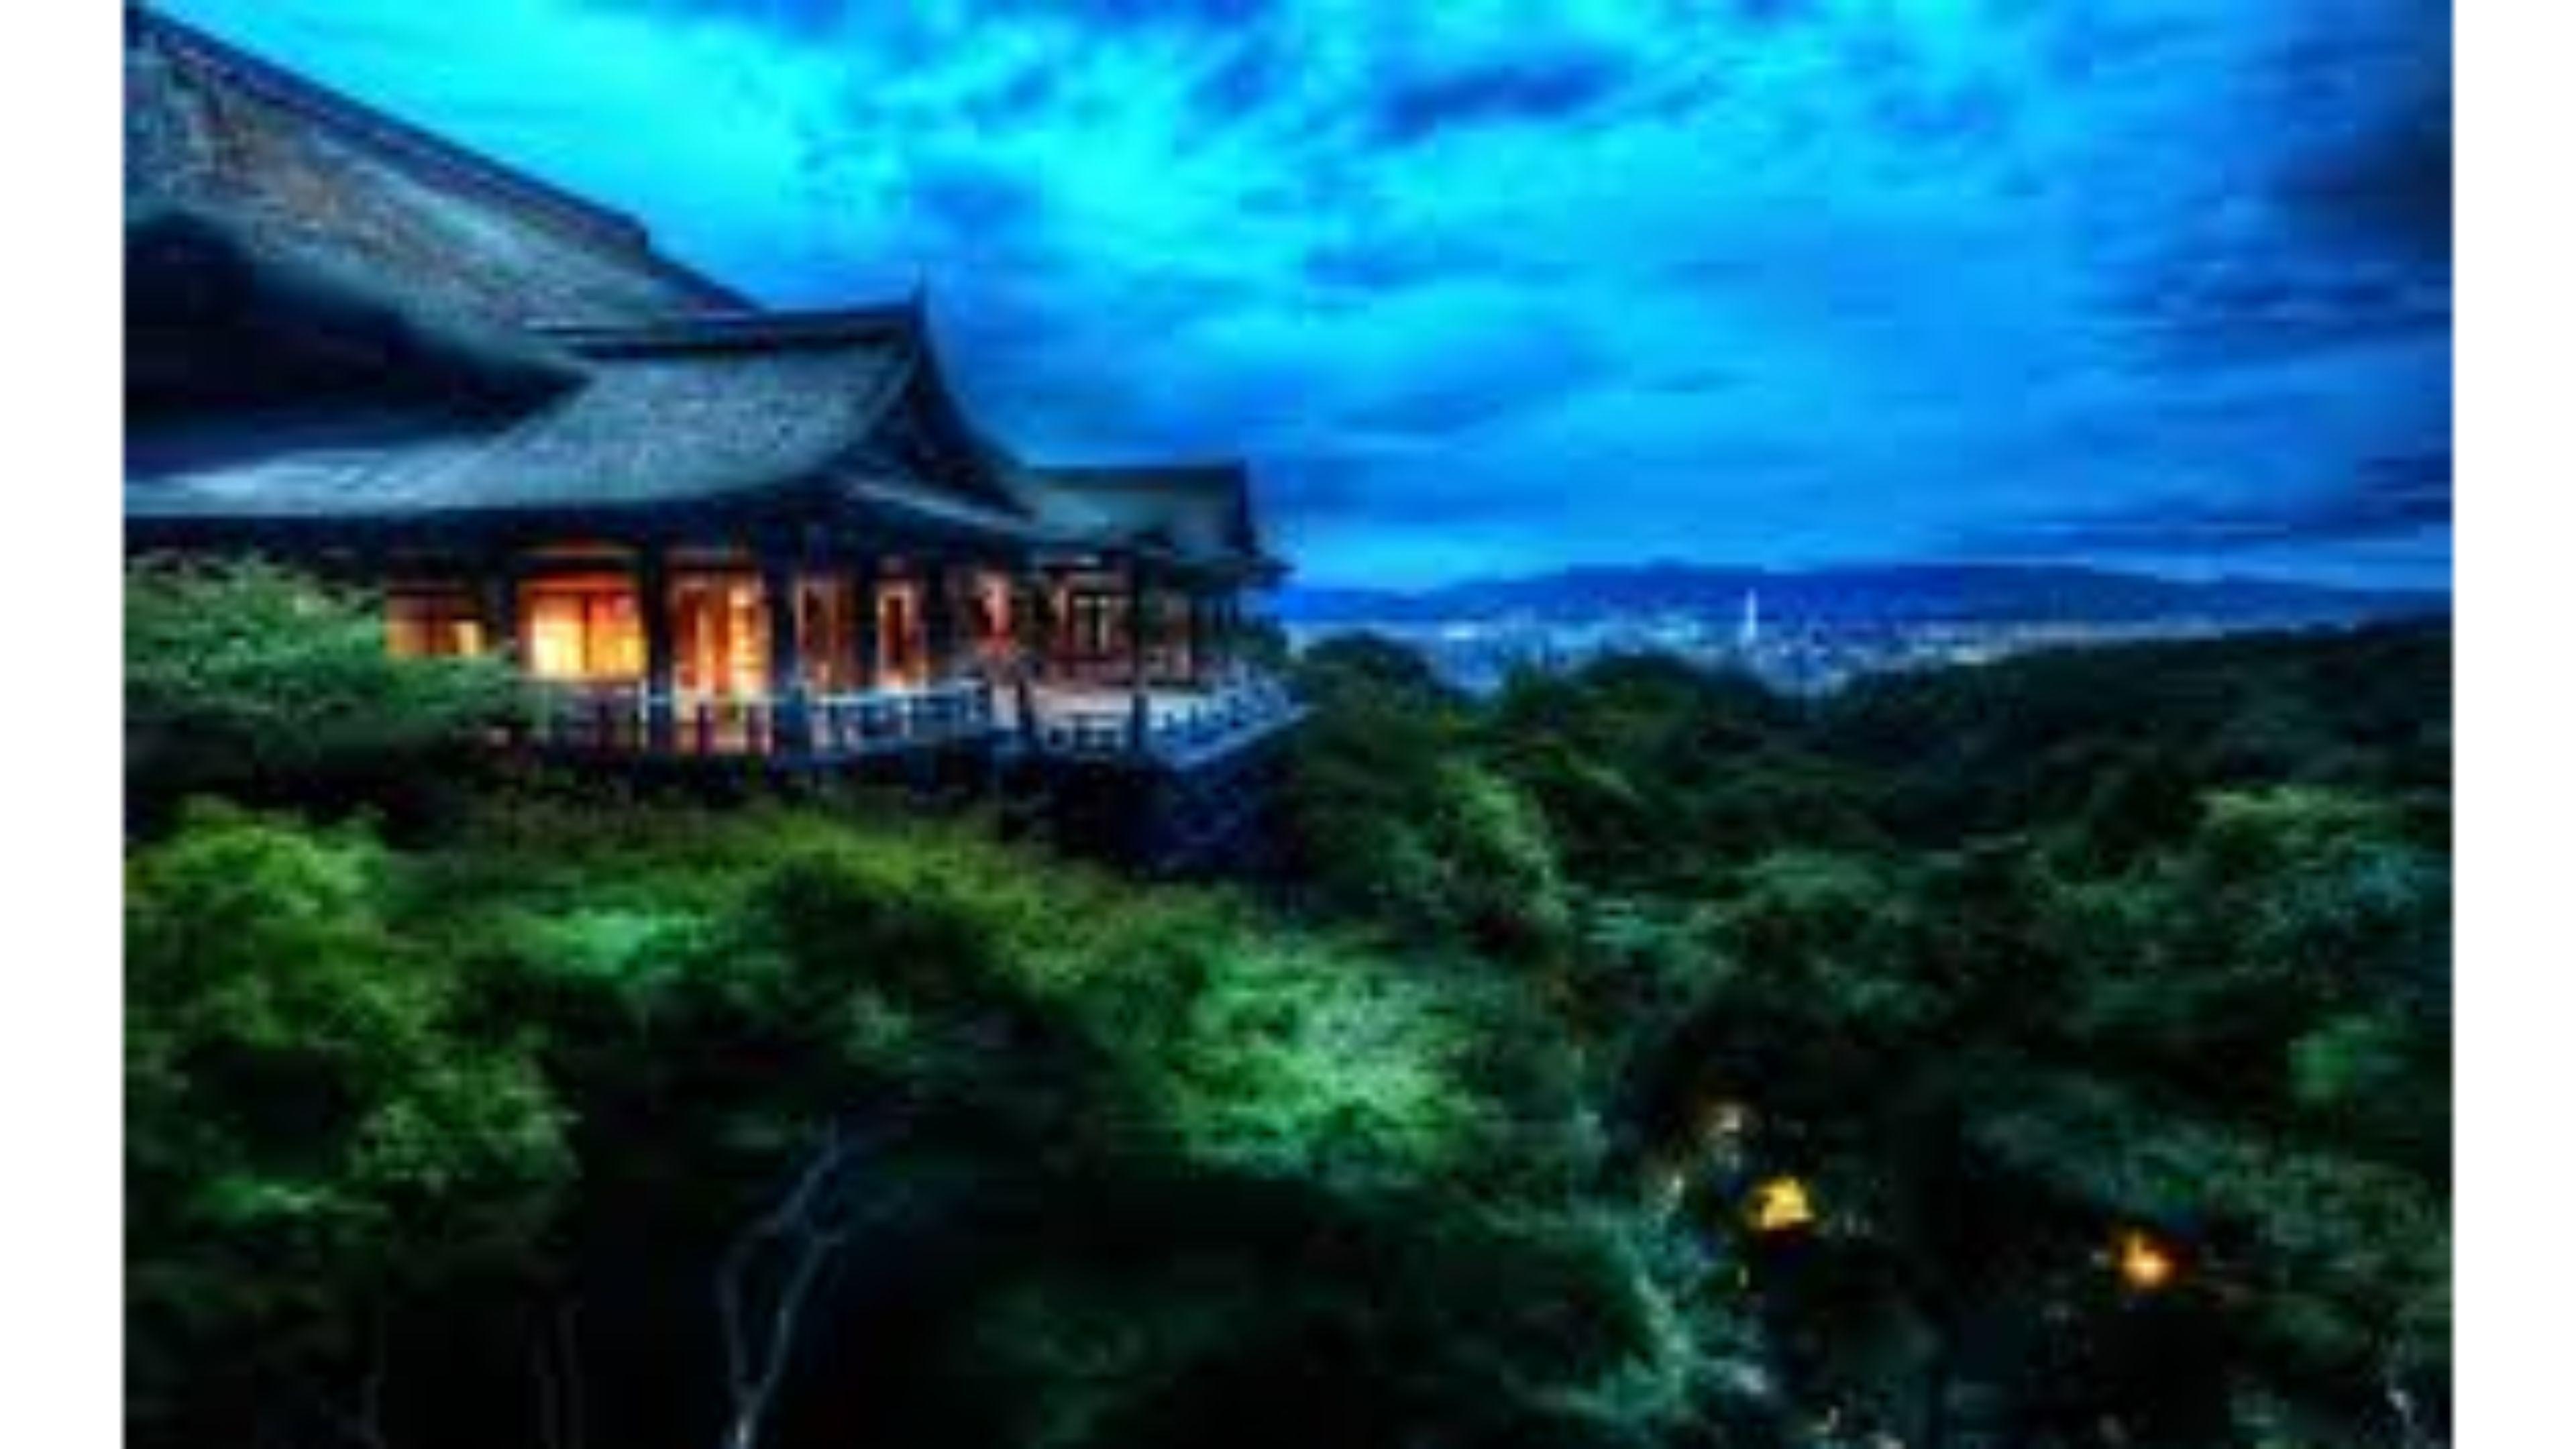 Trending 2016 Kyoto, Japan 4K Wallpaper   Free 4K Wallpaper